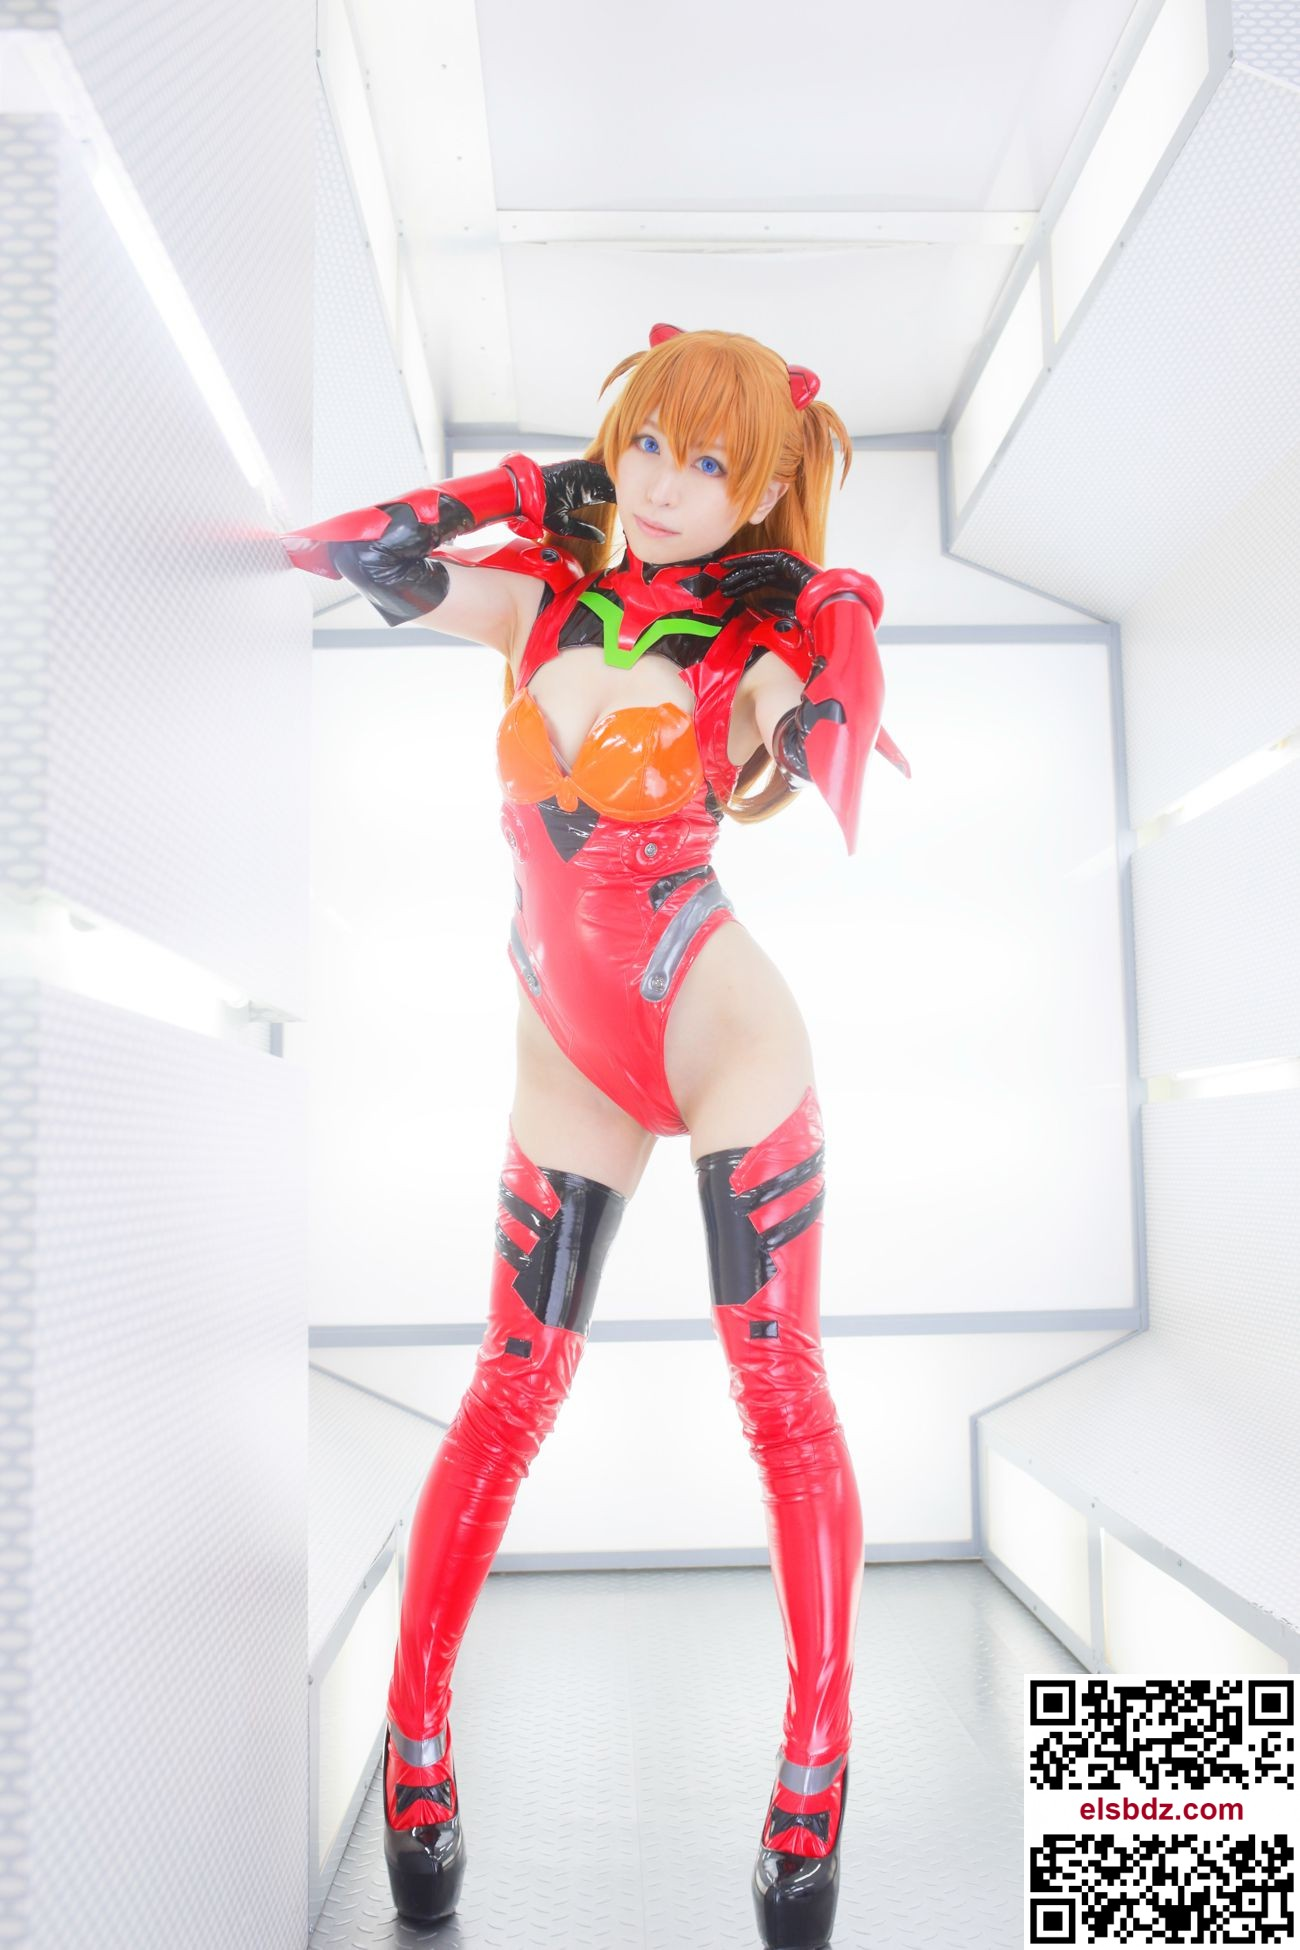 Cosplay みやこどんぶり みやこりお Asuka 2nd插图(11)